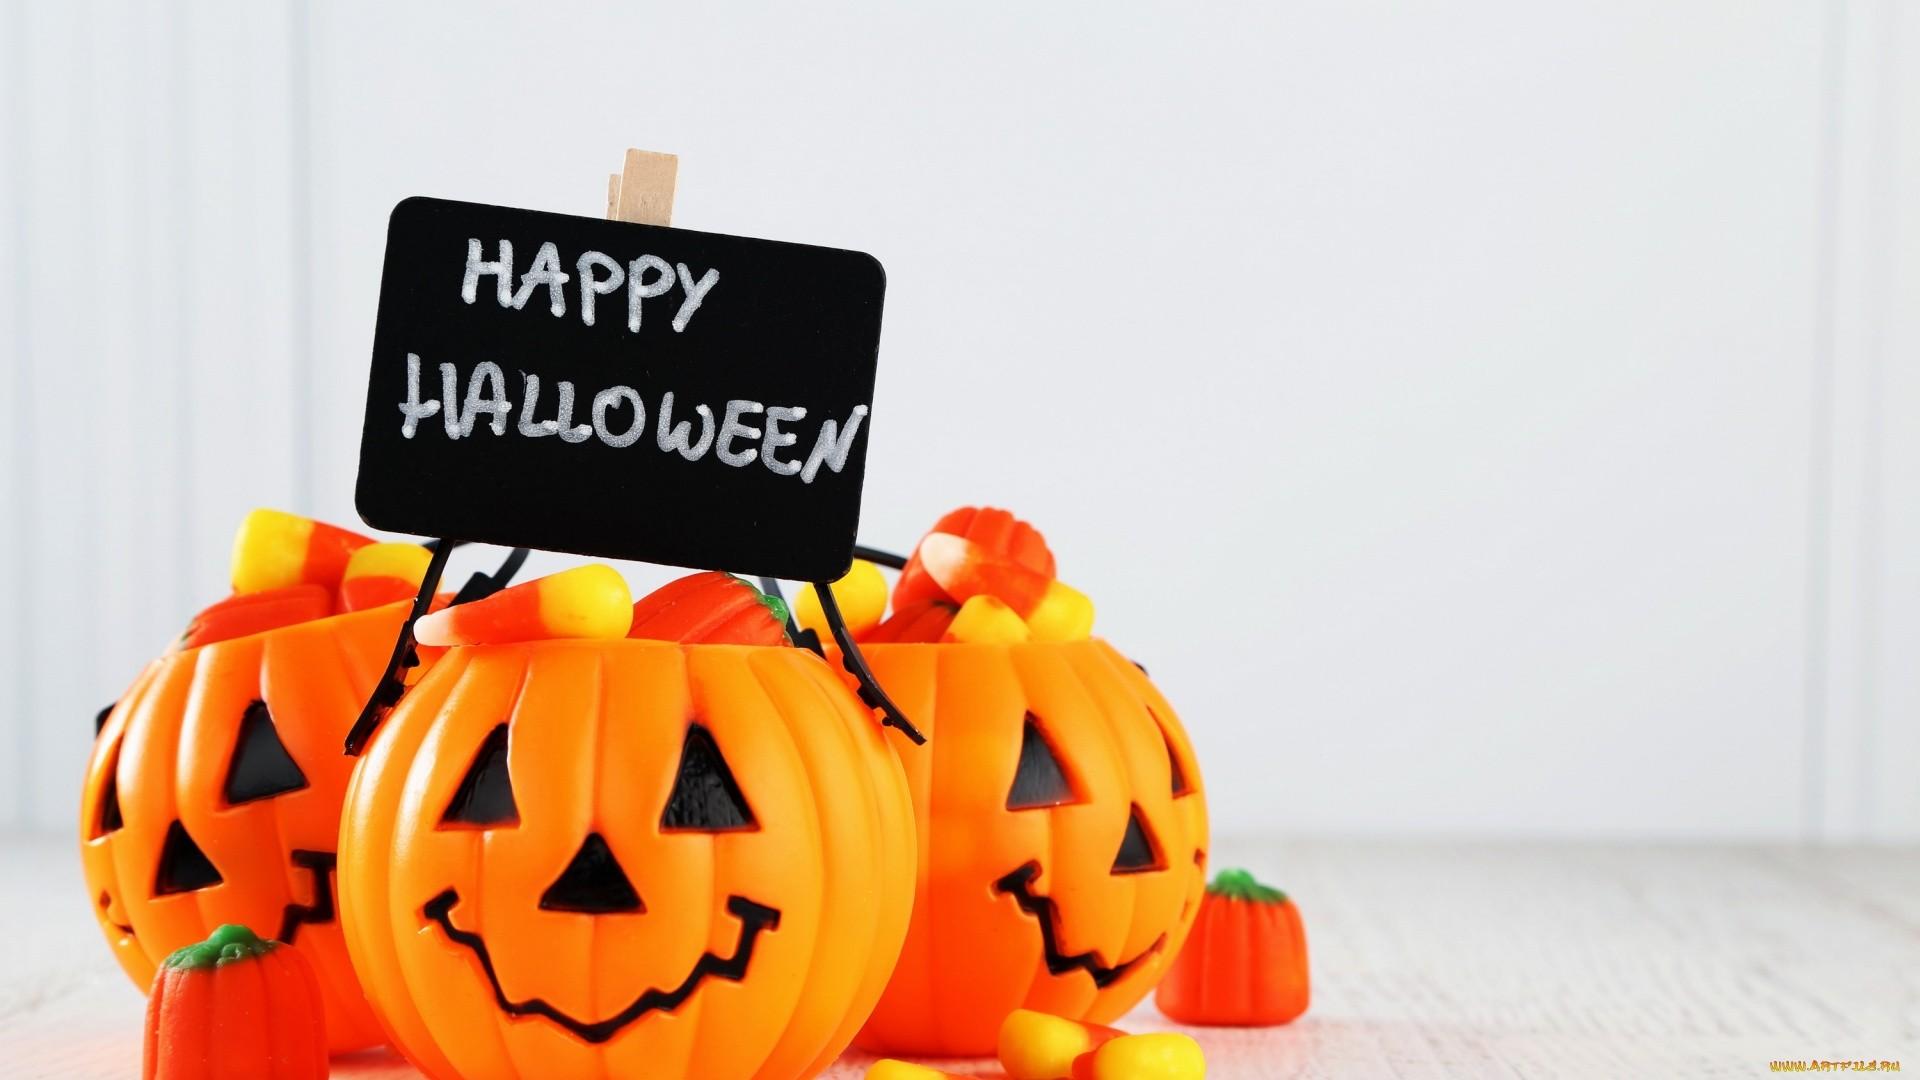 Halloween Greeting Card HD Wallpaper